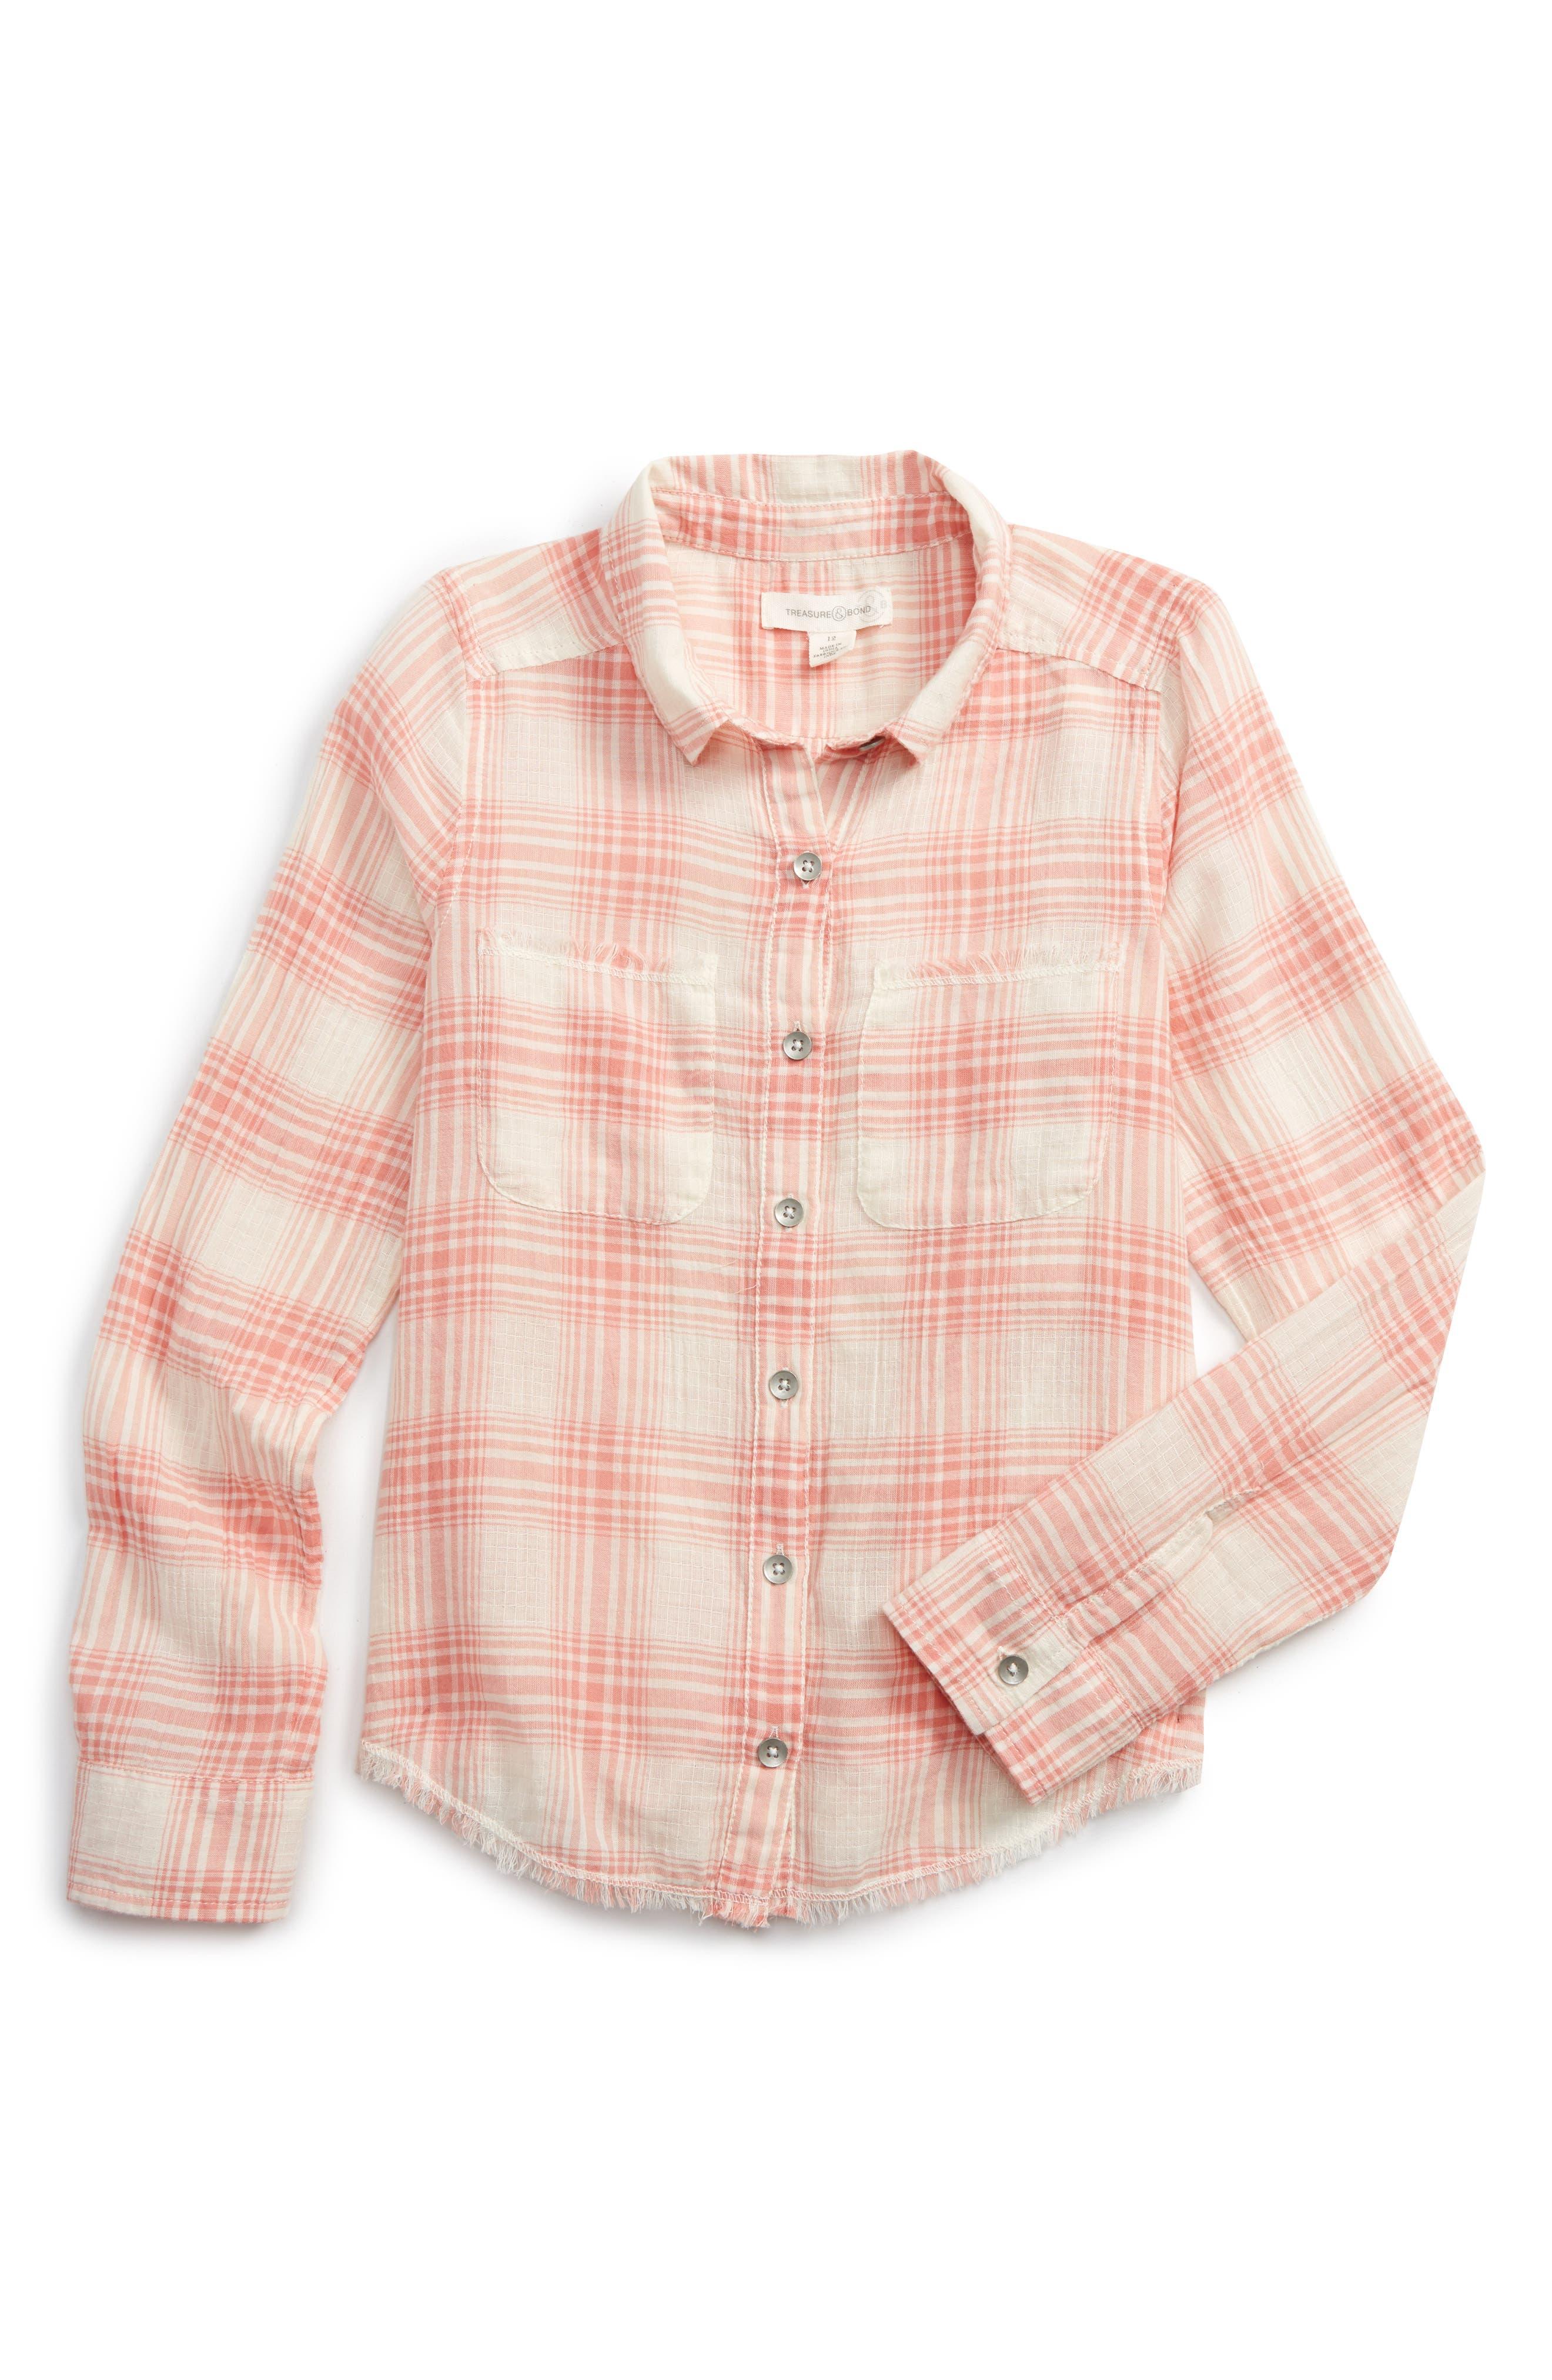 Plaid Shirt,                         Main,                         color, Pink Lily Summer Plaid